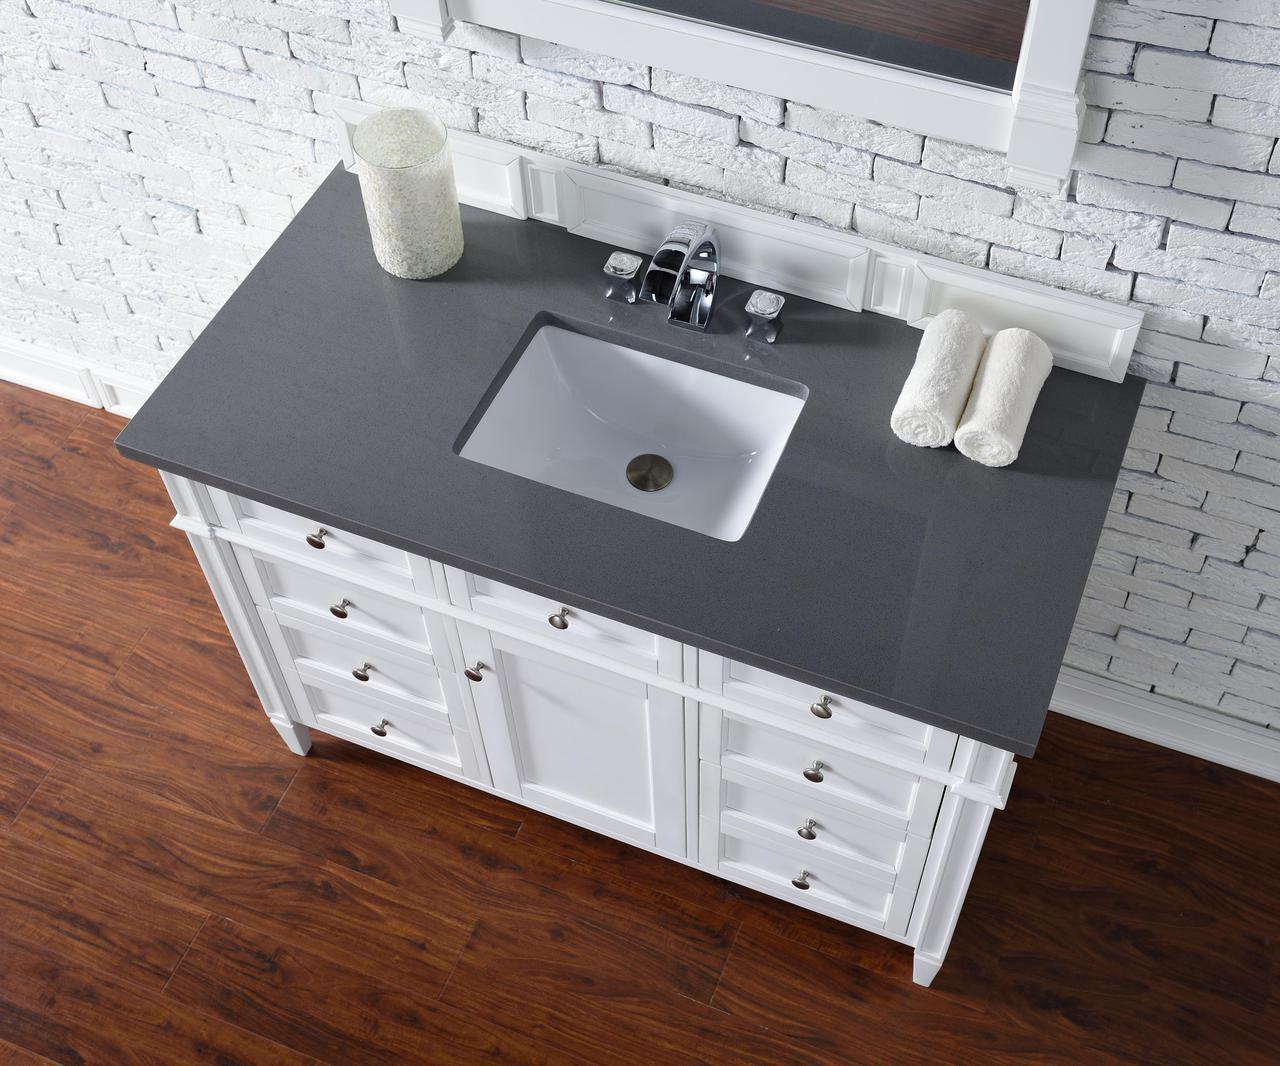 Modern Bathroom Vanity No Top : James martin brittany collection quot single vanity